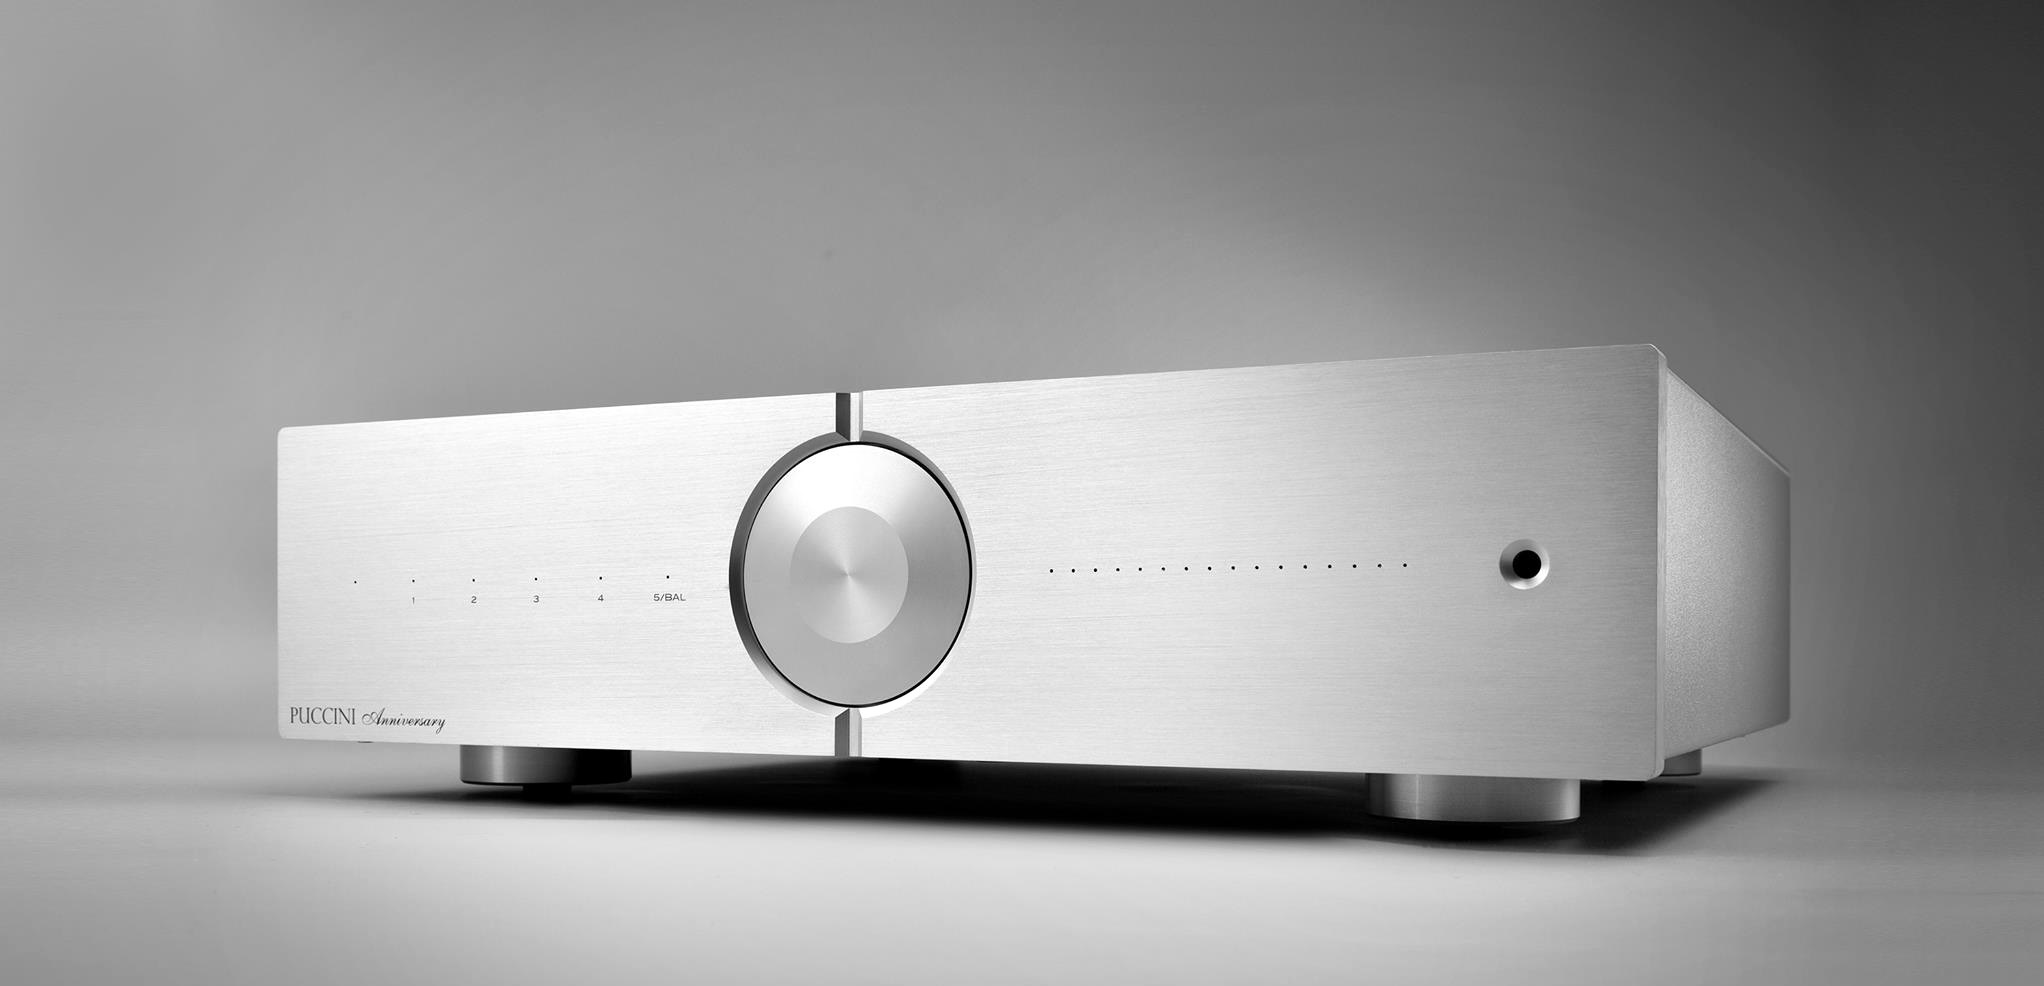 audioanalopuccini-anniversary-amplifier-silver